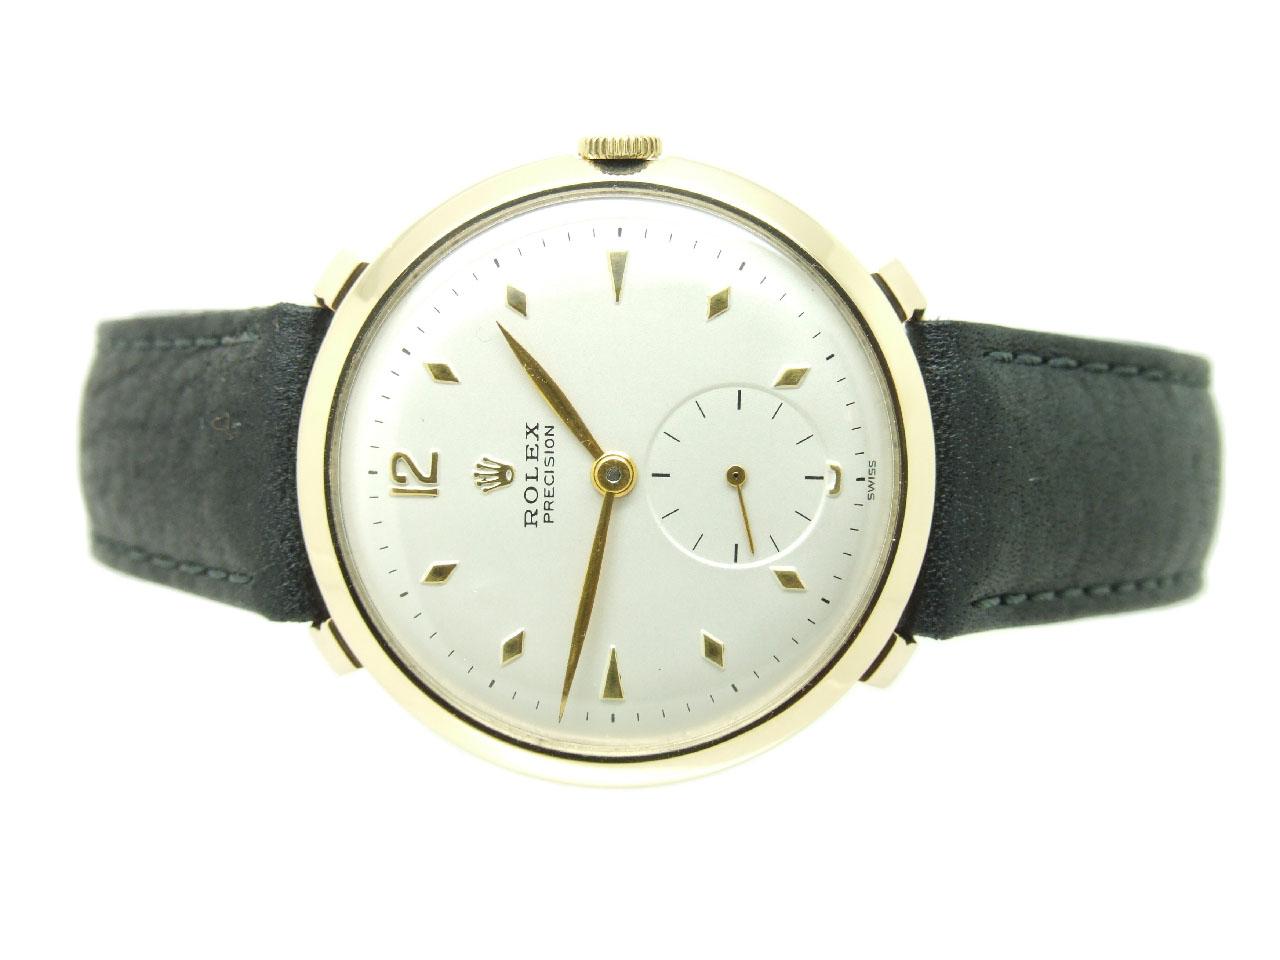 1954 Solid Gold Oversize Rolex Precision Vintage Watch Vw564 Vintage Winders